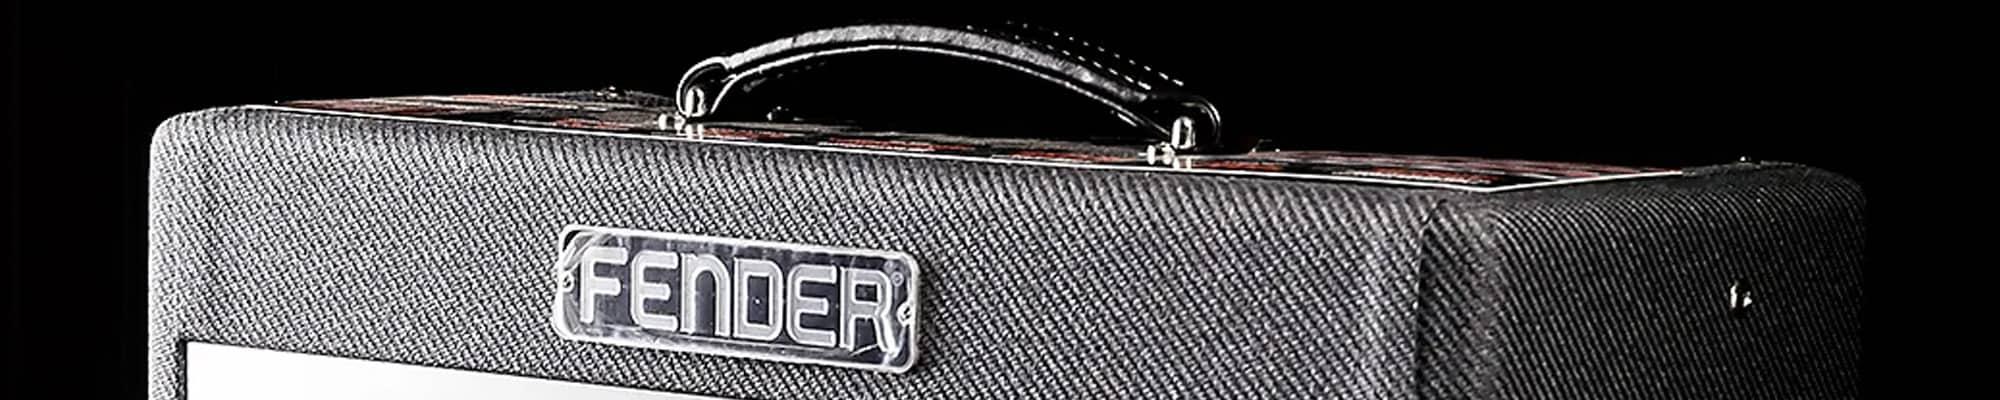 Packing Heat: Exploring Fender's Smaller Amps | Reverb News